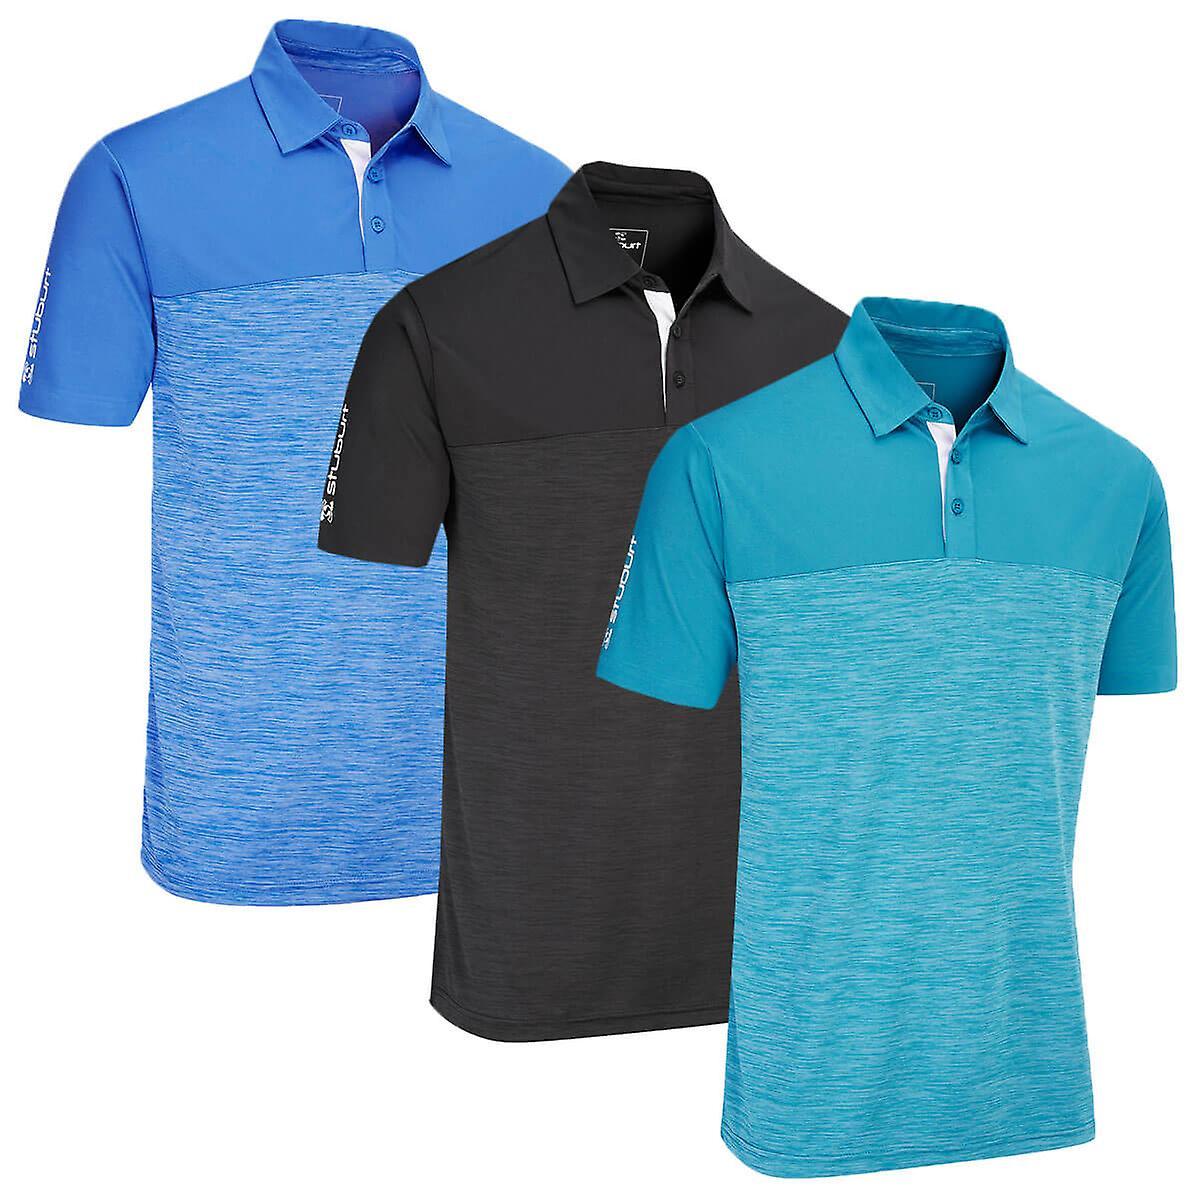 Stuburt Mens Evolve Obley Moisture Wicking Golf Polo Shirt